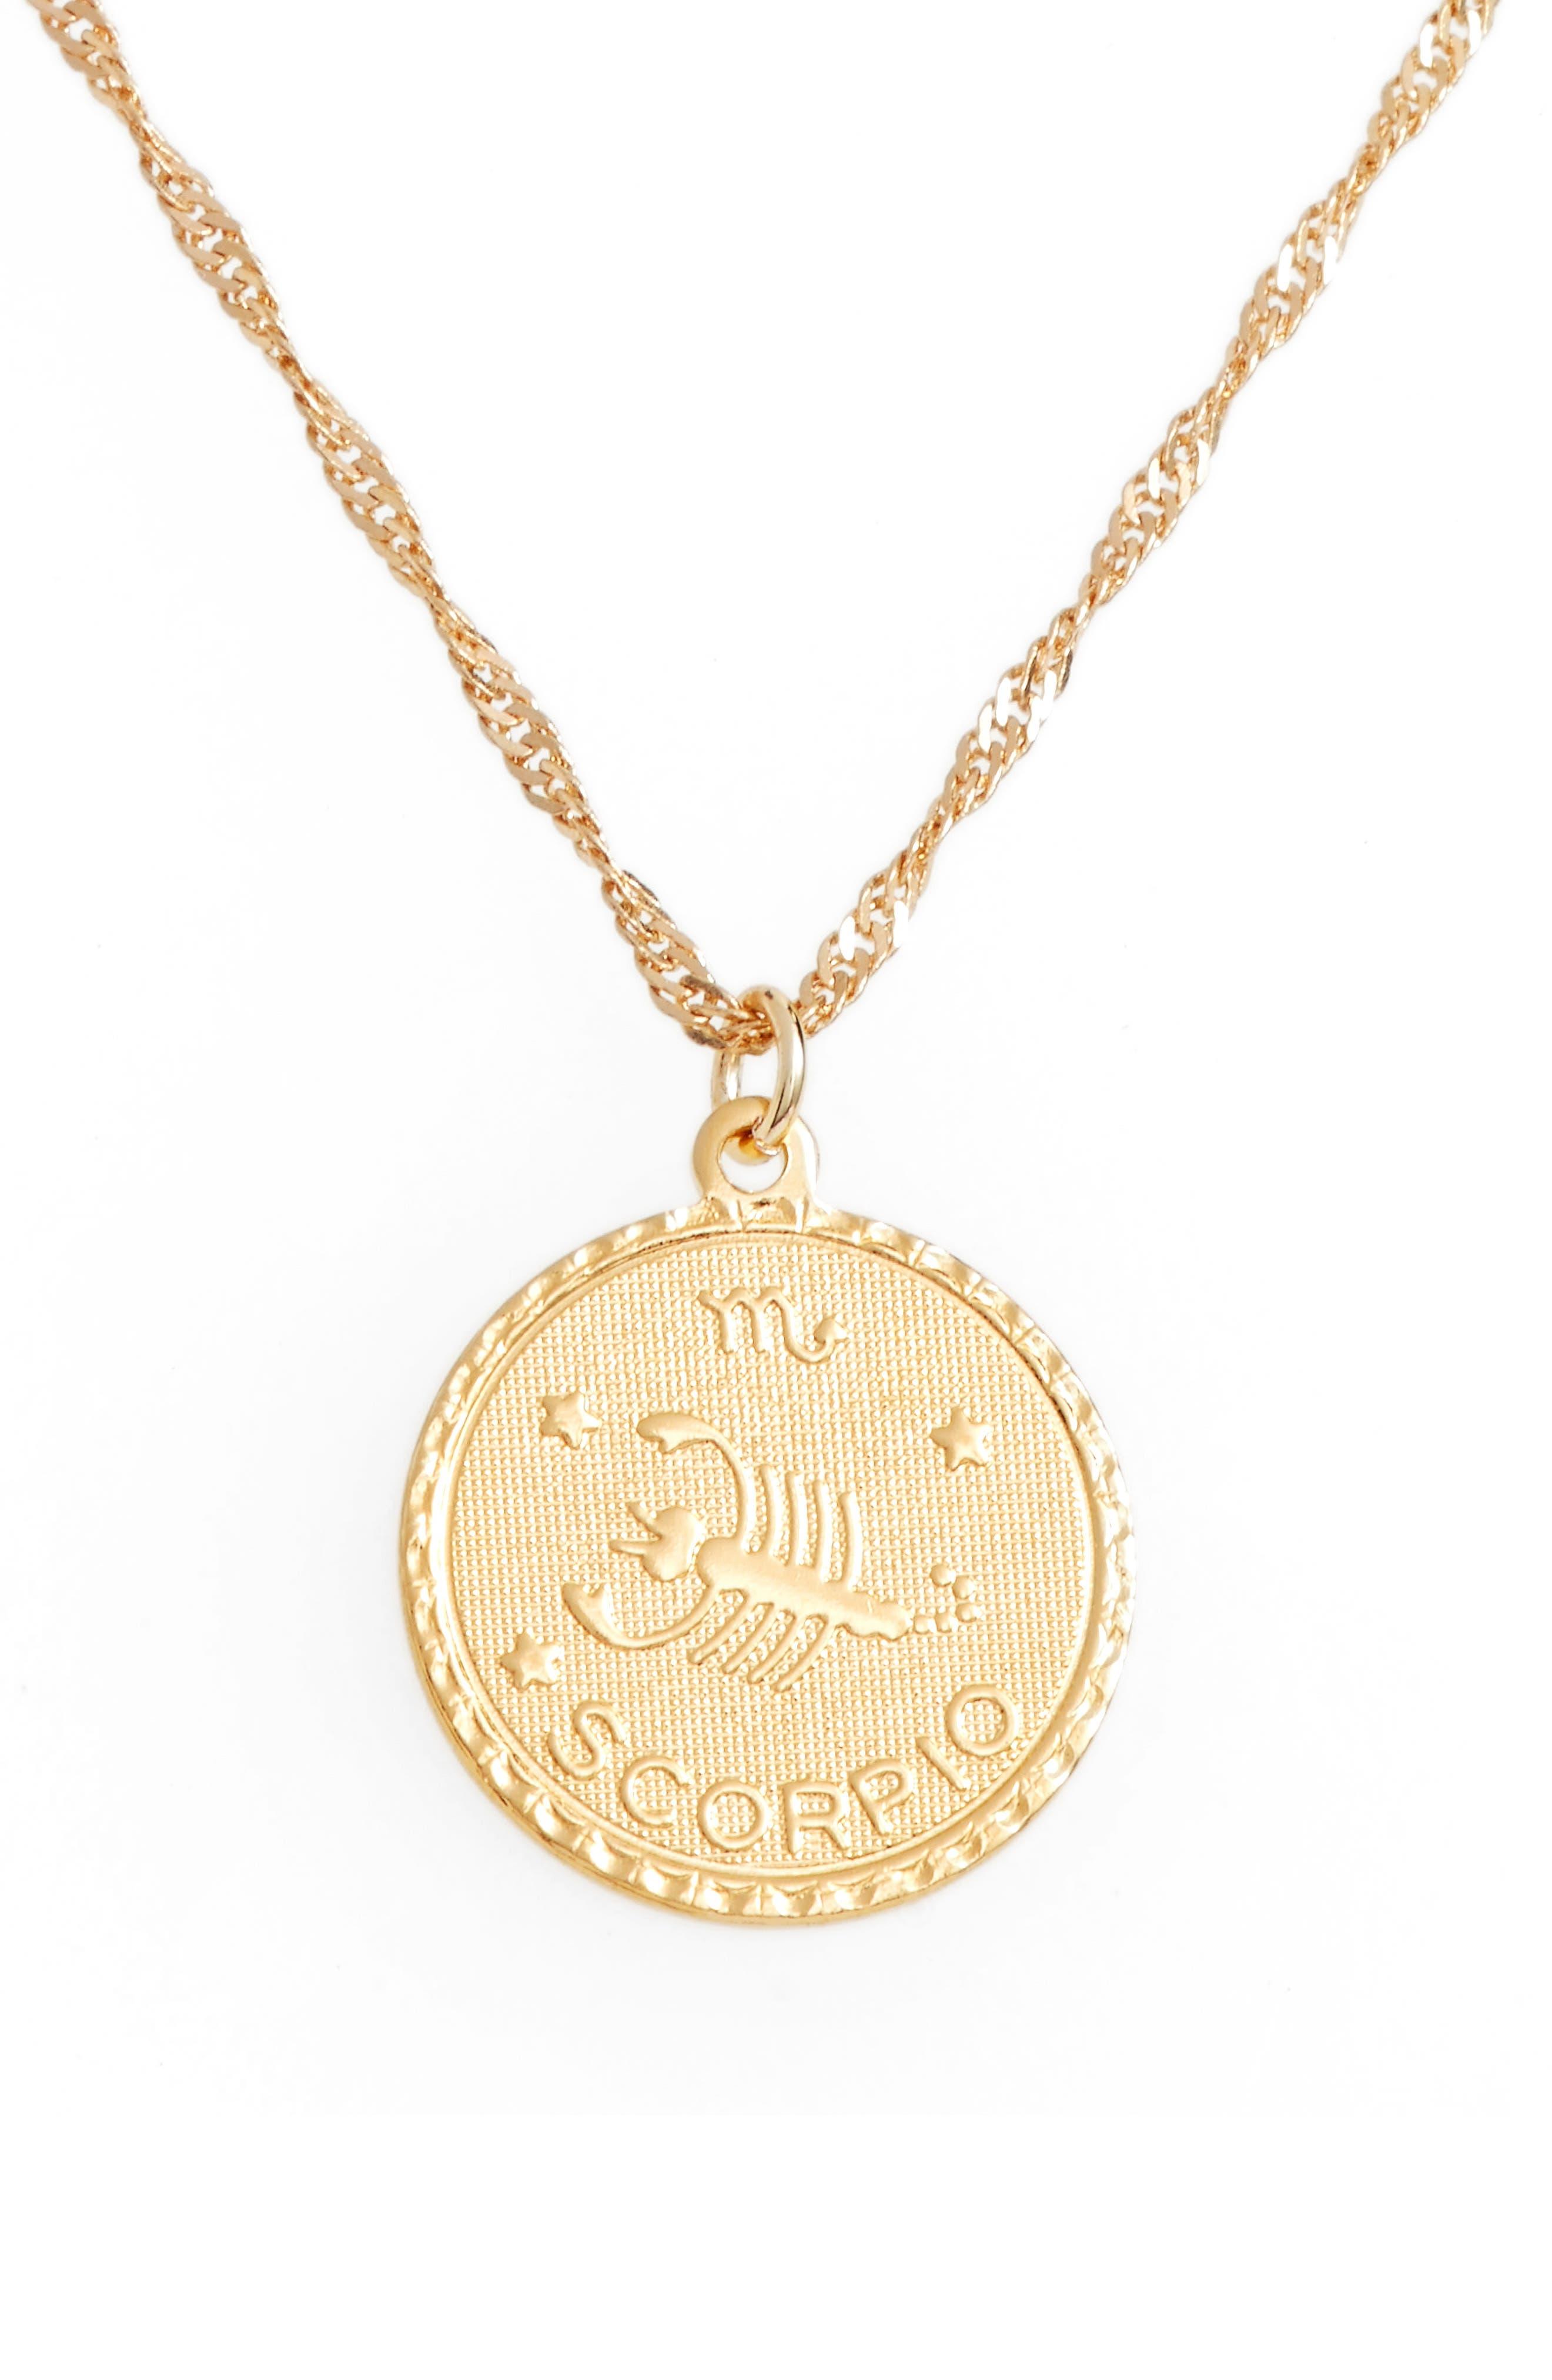 Ascending Scorpio Pendant Necklace,                         Main,                         color, Yellow Gold